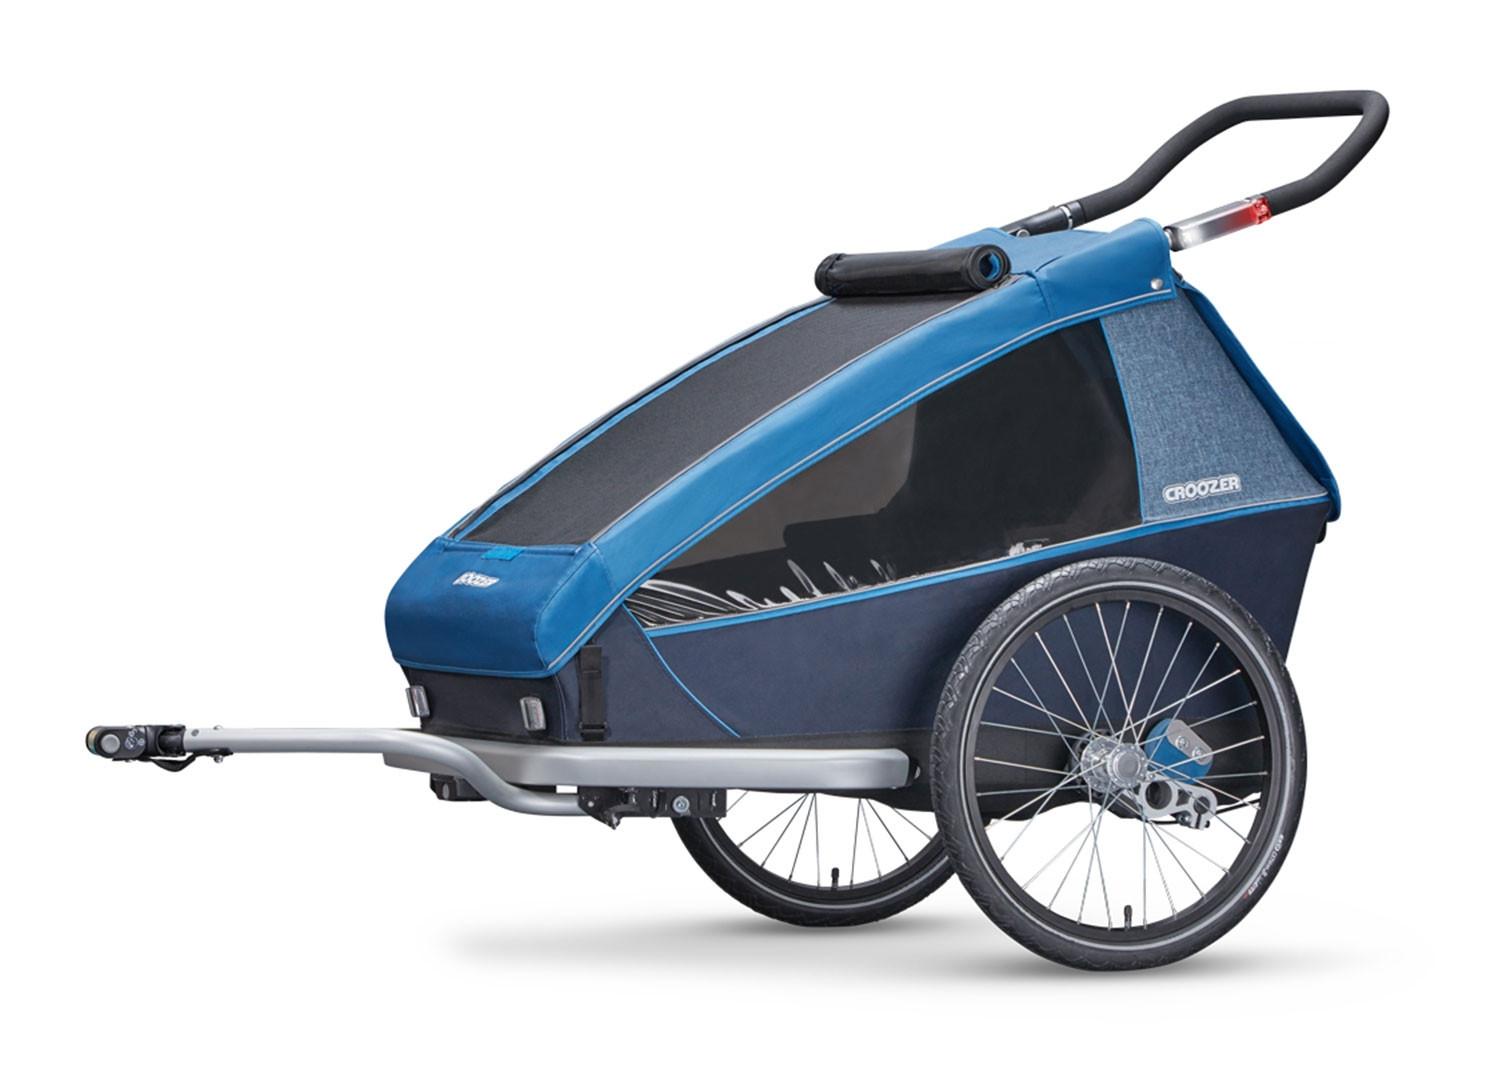 Vozík za kolo Croozer Kid Plus for 2 2018